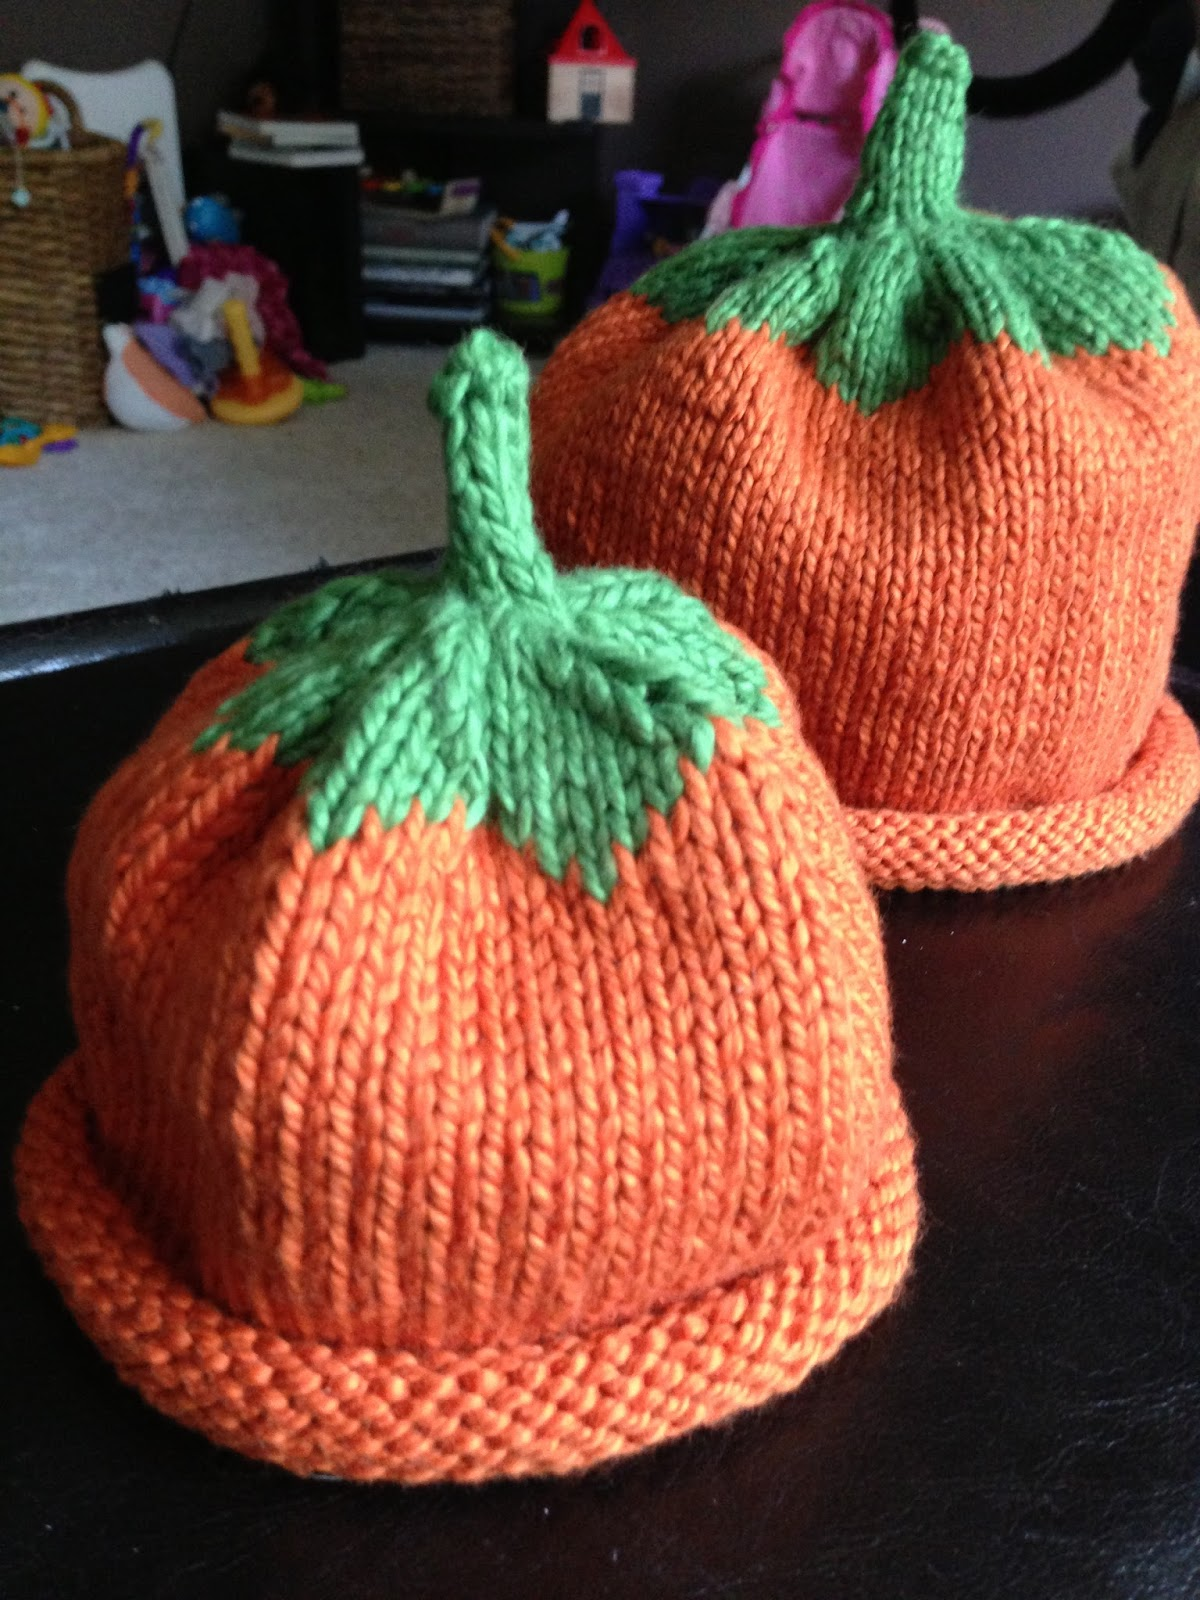 Pumpkin Hat Knitting Pattern : Knitted Pumpkin Hats for Wee Ones Rebecca Mongrains Blog